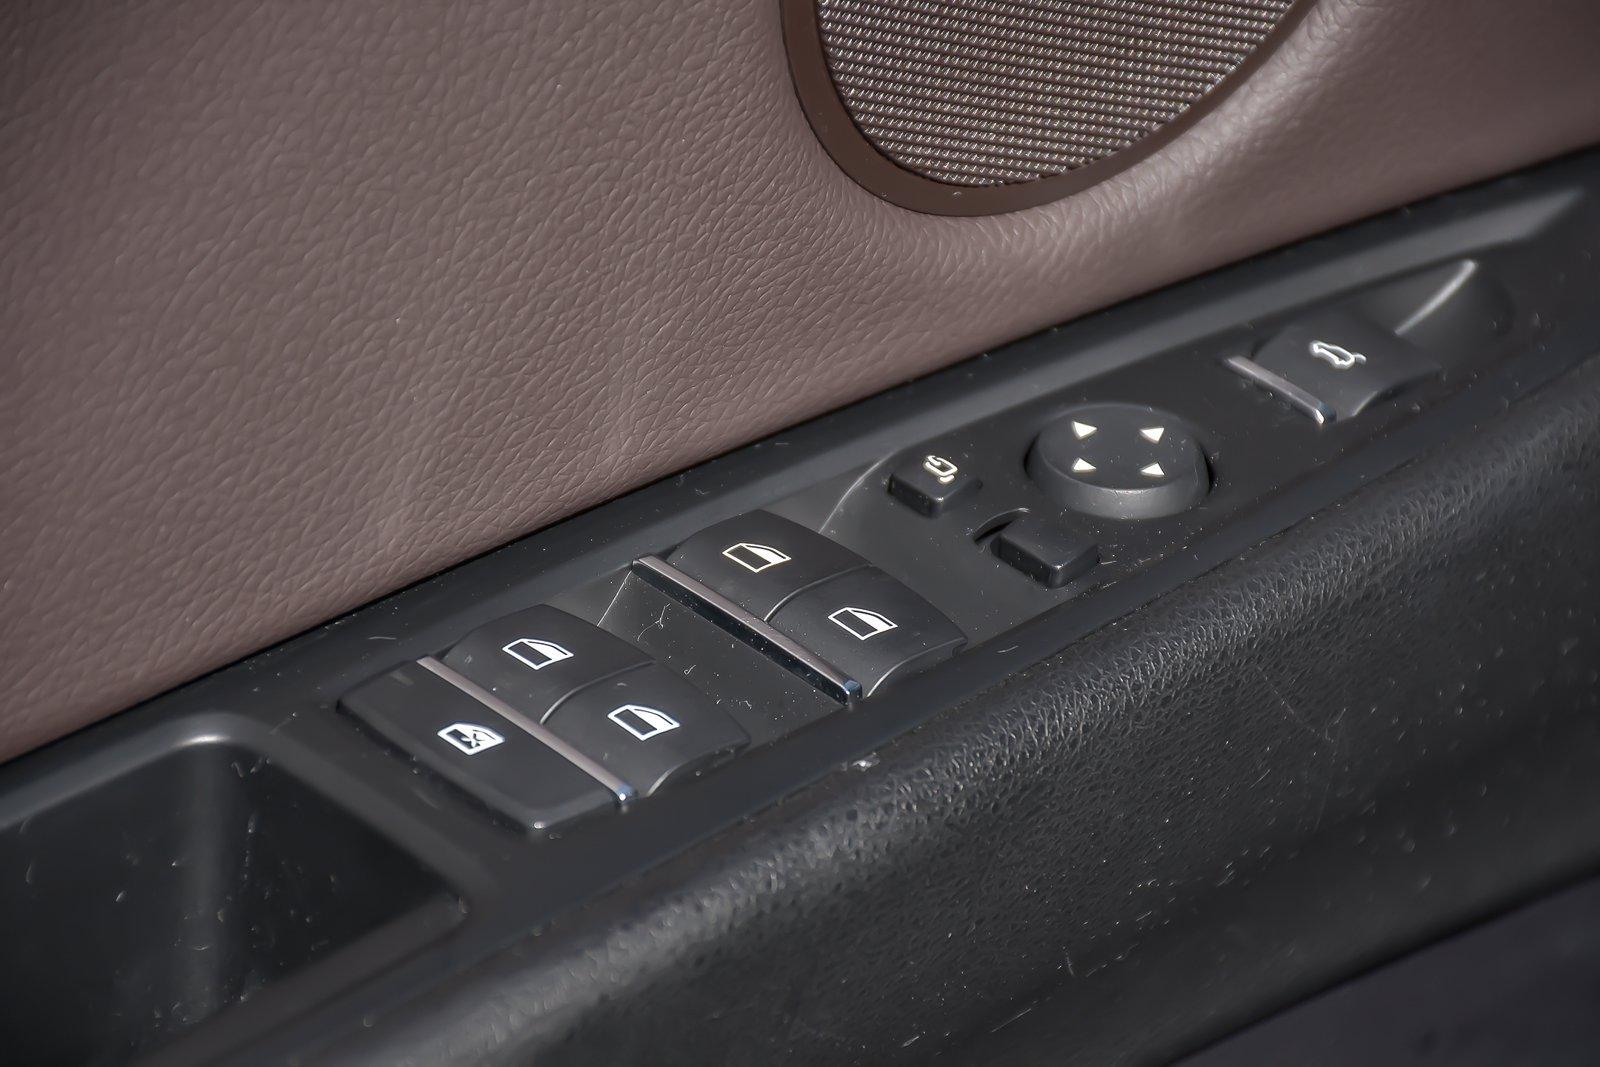 Used 2018 BMW X5 xDrive35i Luxury, 3rd Row, | Downers Grove, IL